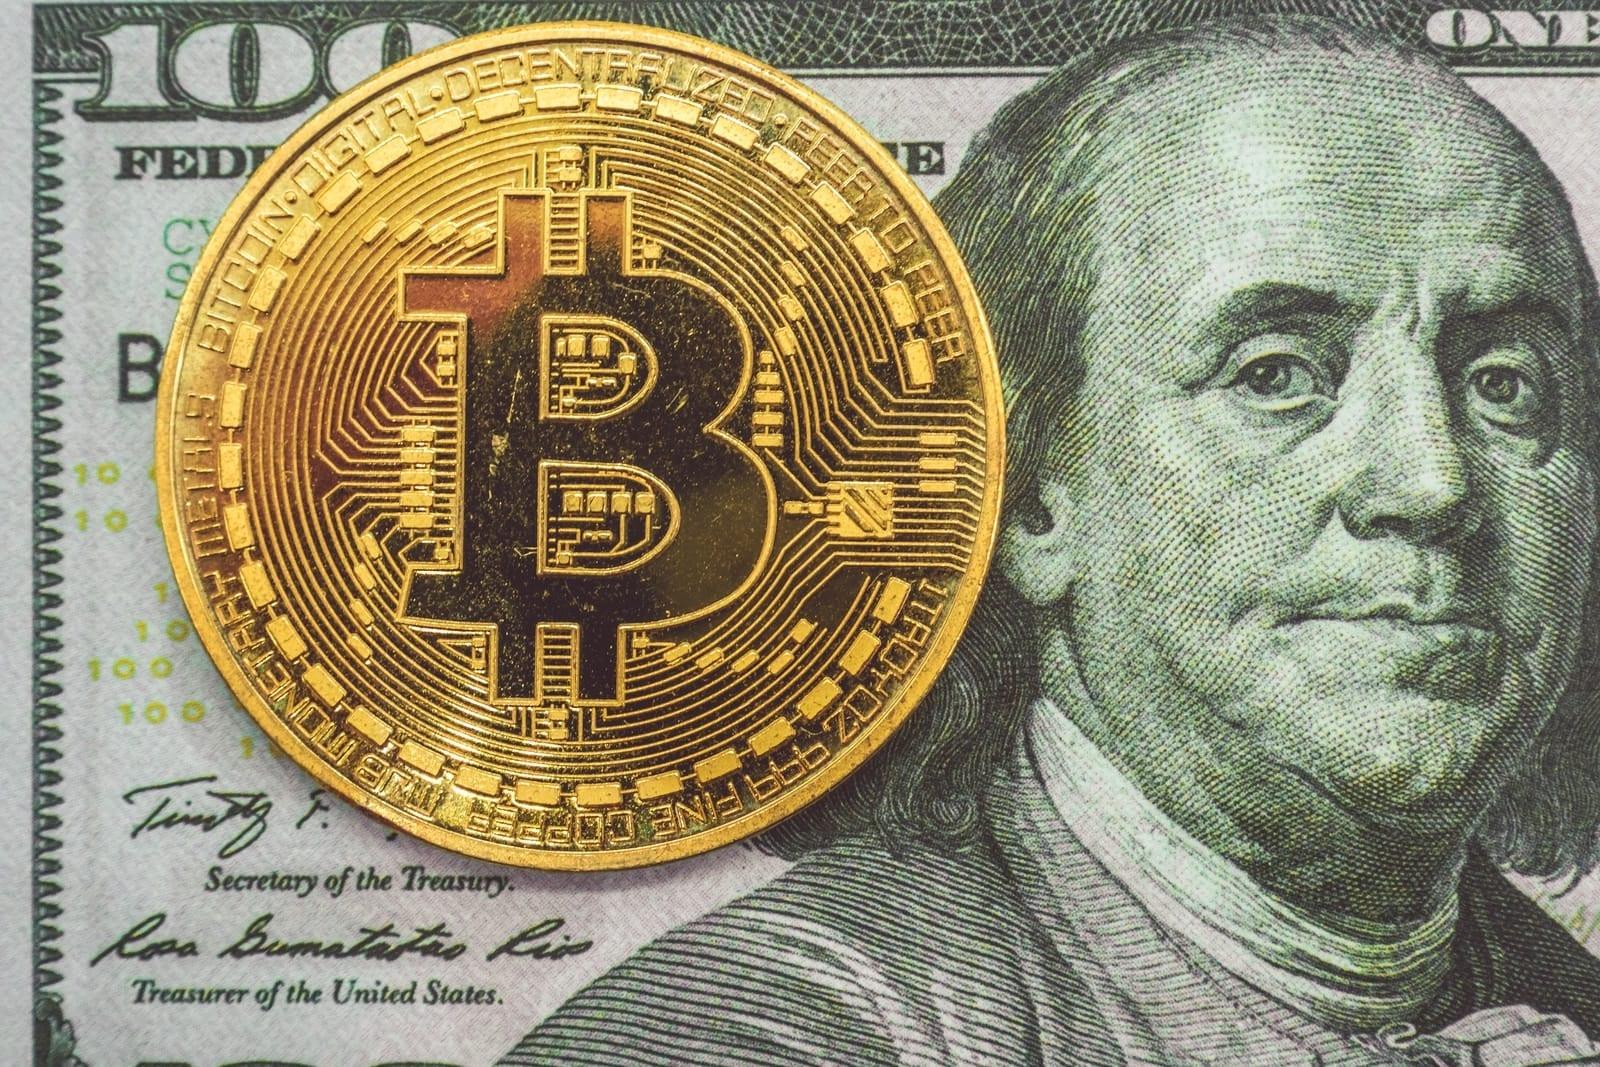 25 Blockchain/Crypto Venture Capital Funds